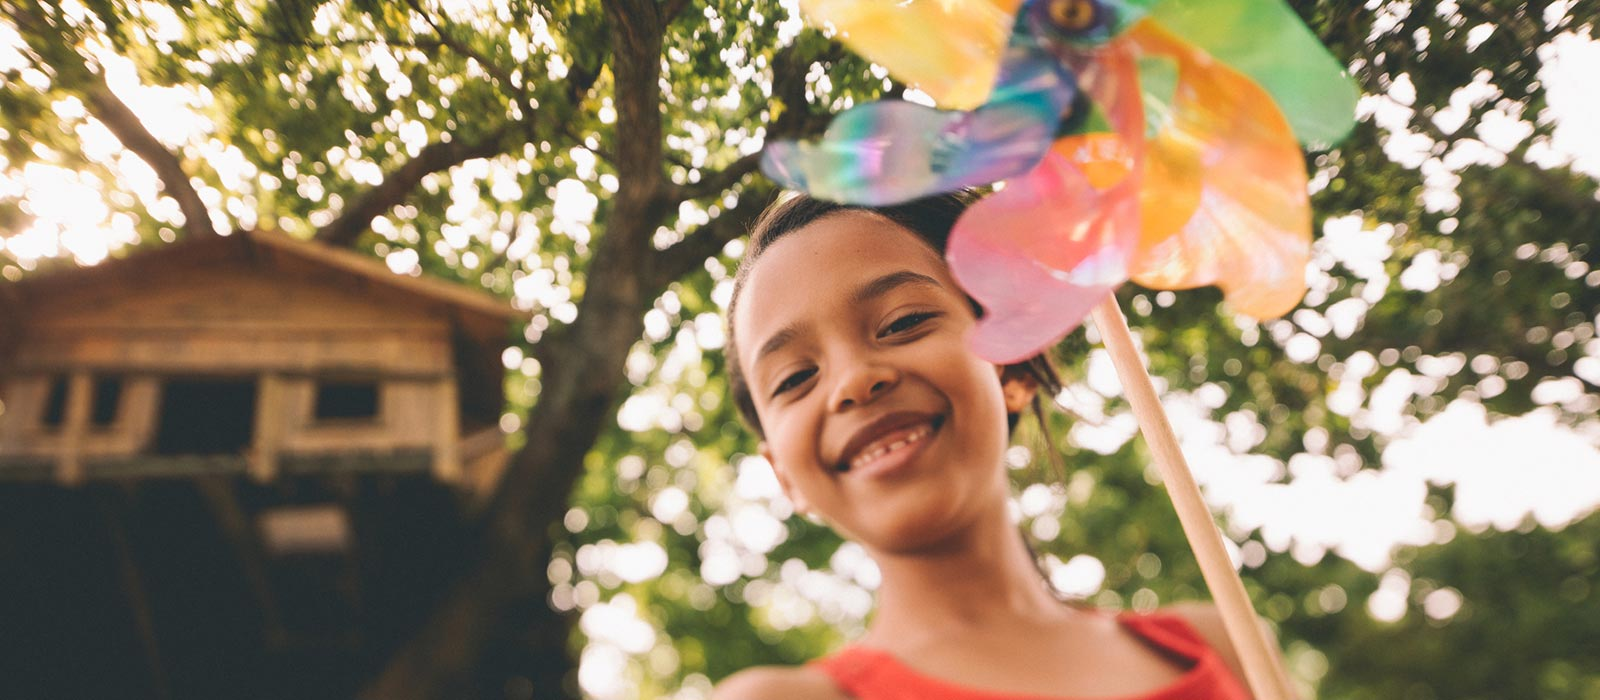 Girl holding a pinwheel